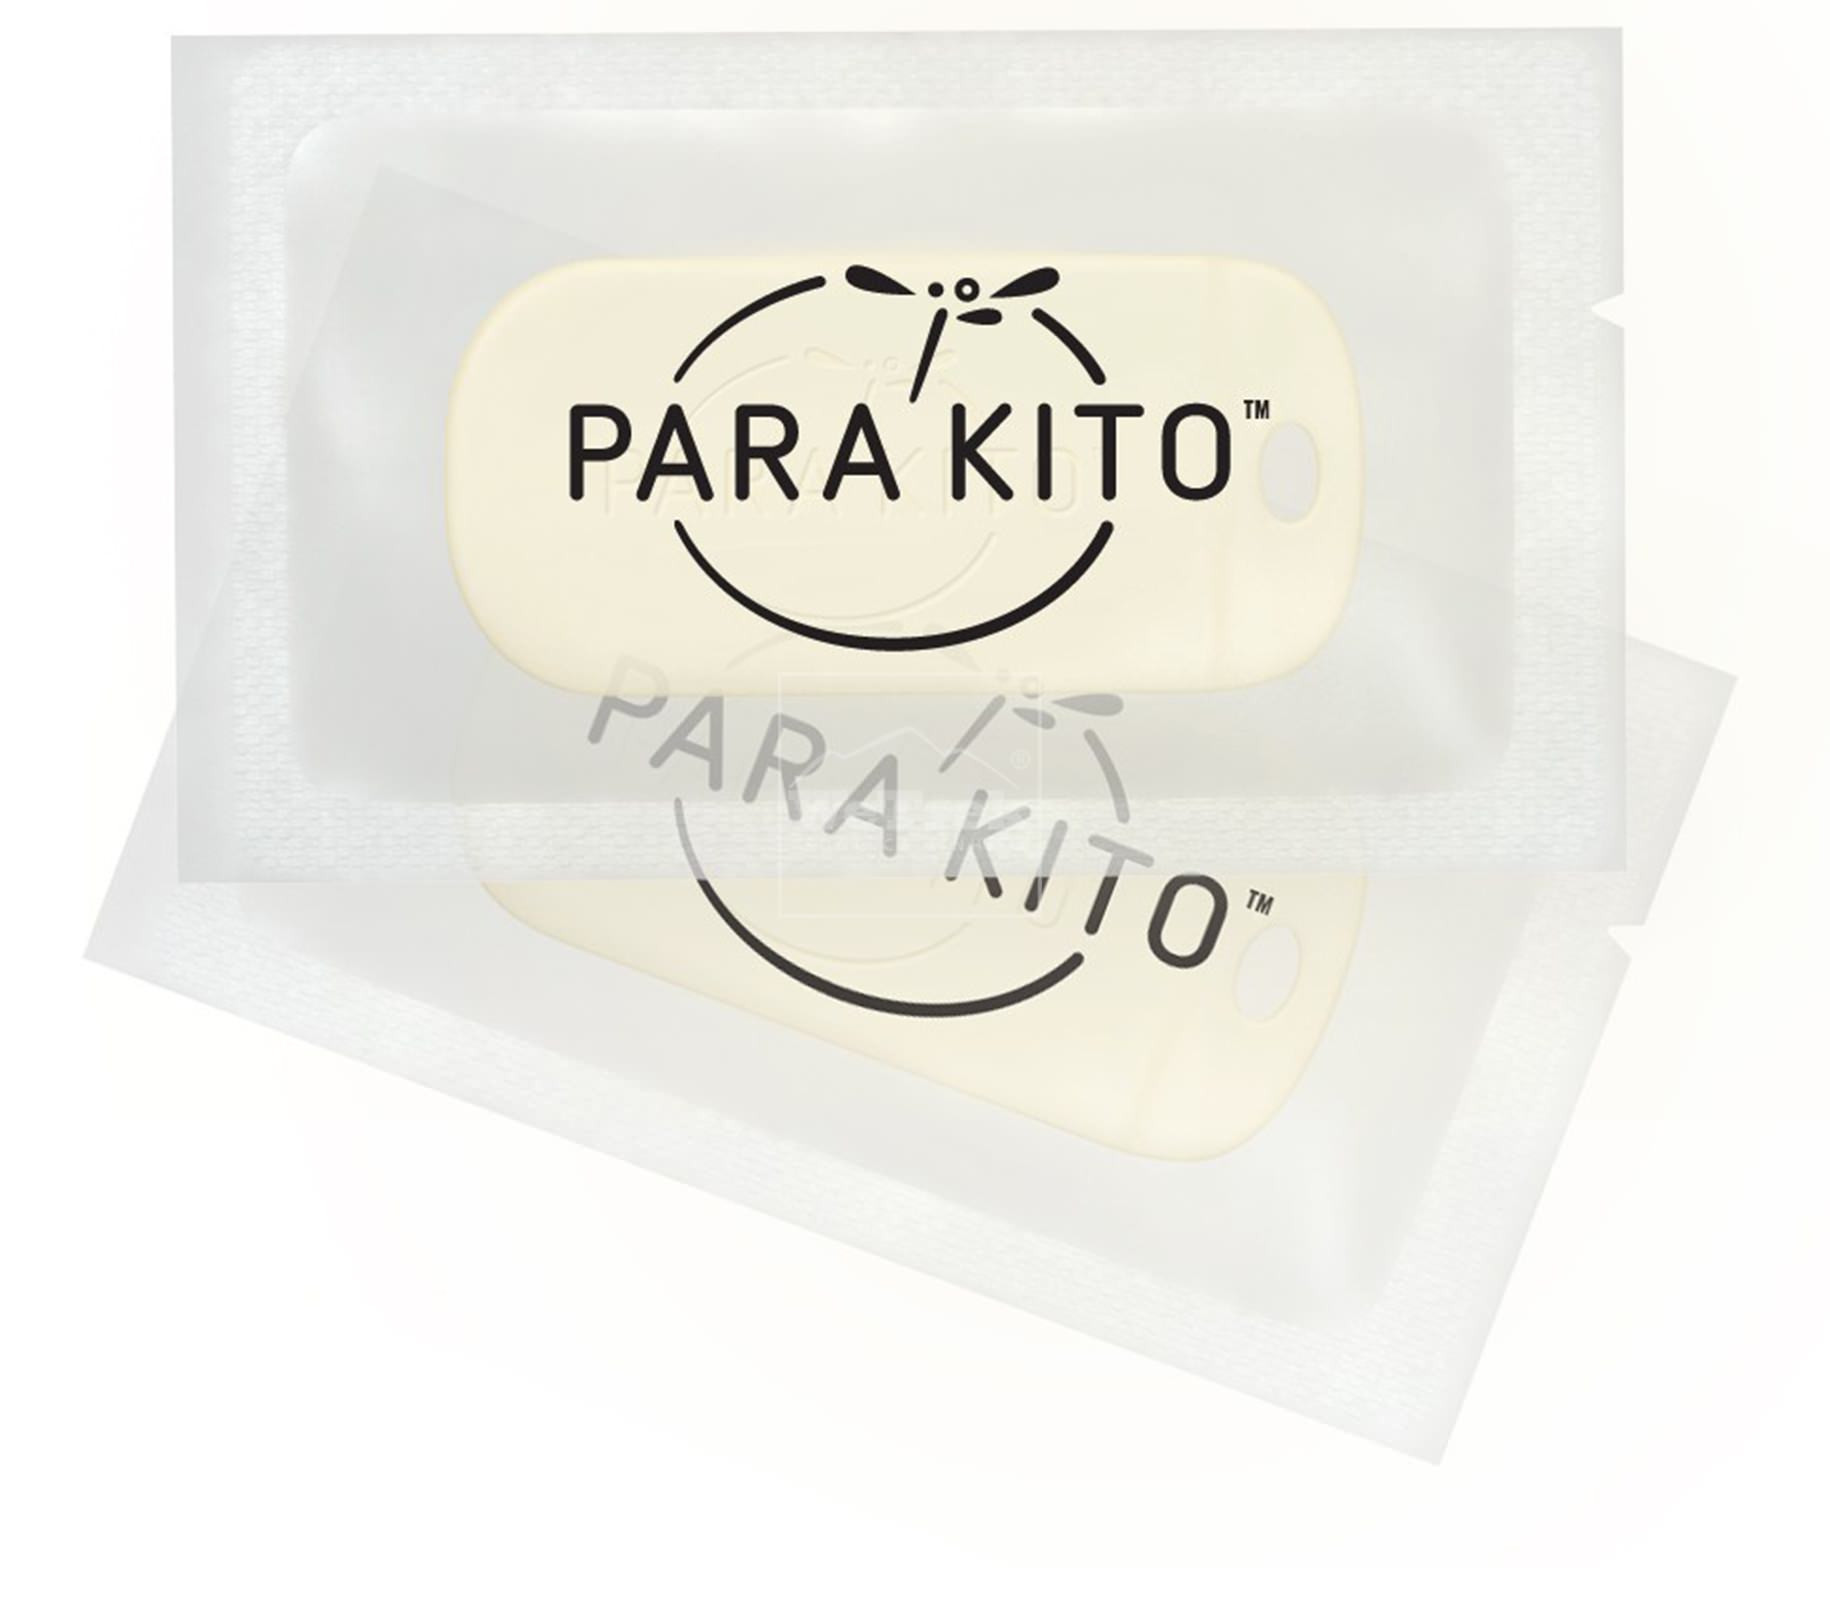 sap-chong-muoi-kem-vong-tay-tre-em-parakito-pirate-kids-band-7499-wetrek.vn-4